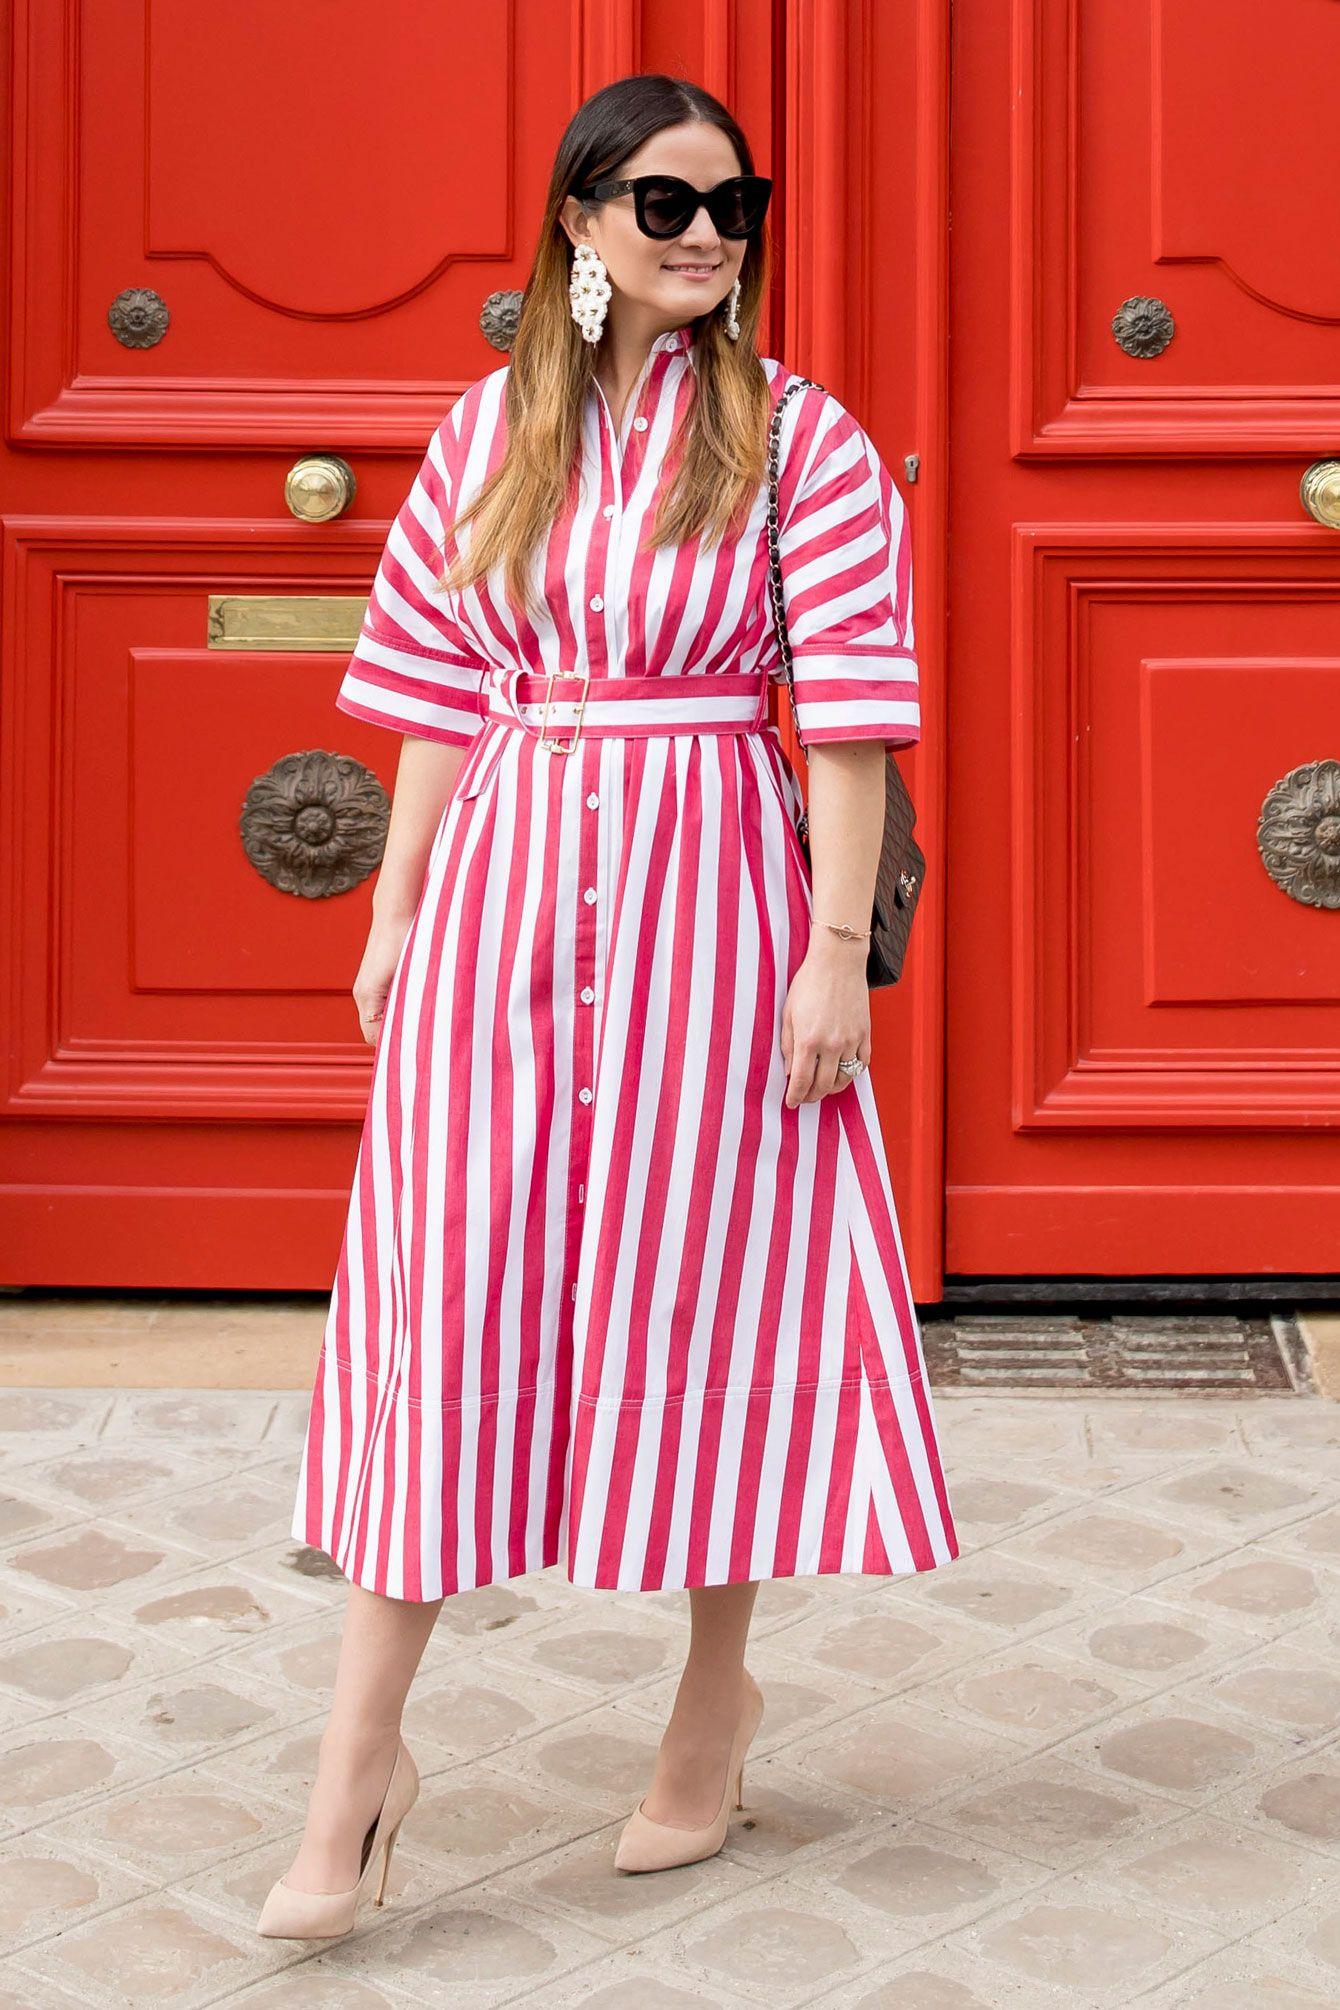 907b7cde90e Rachel Antonoff Red Stripe Dress at Red Doors in Paris